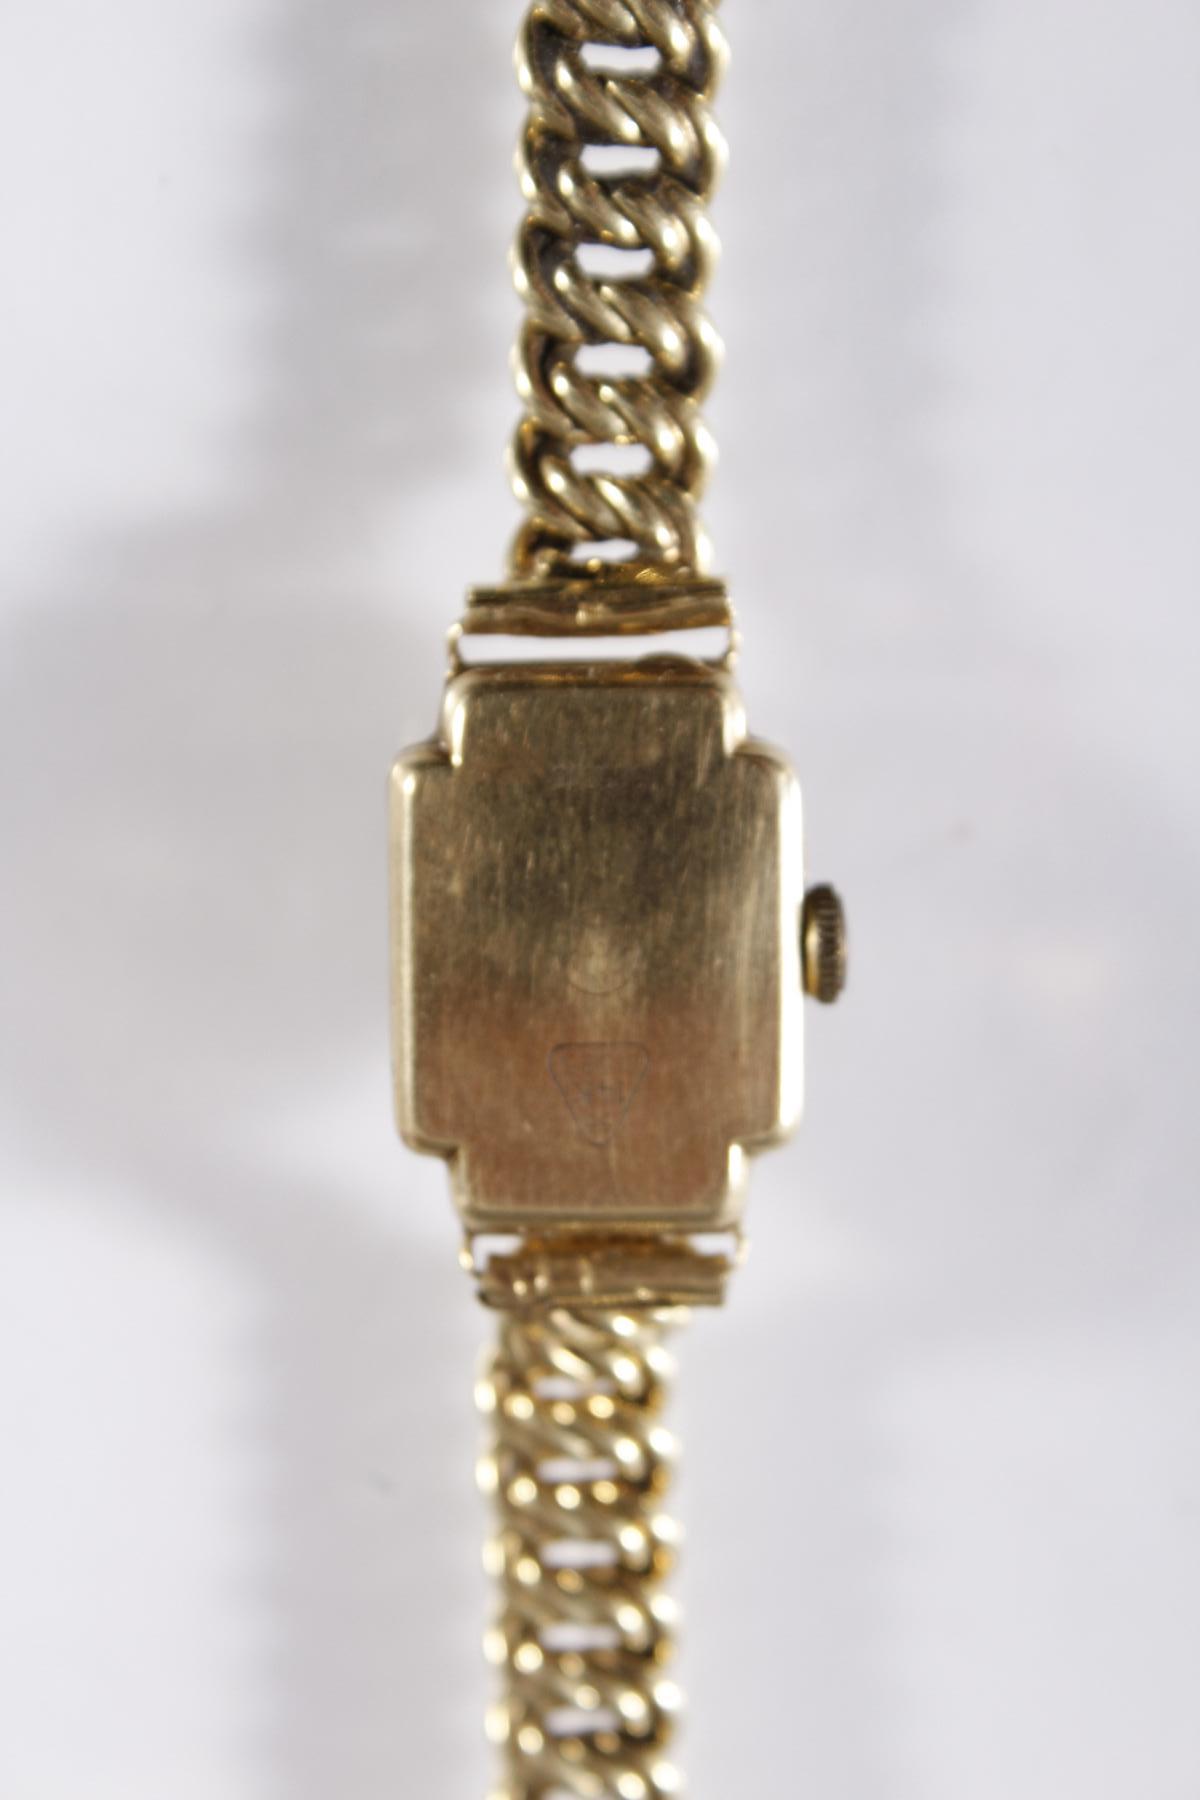 Damenarmbanduhr der Marke Anker, 14 Karat Gelbgold-3